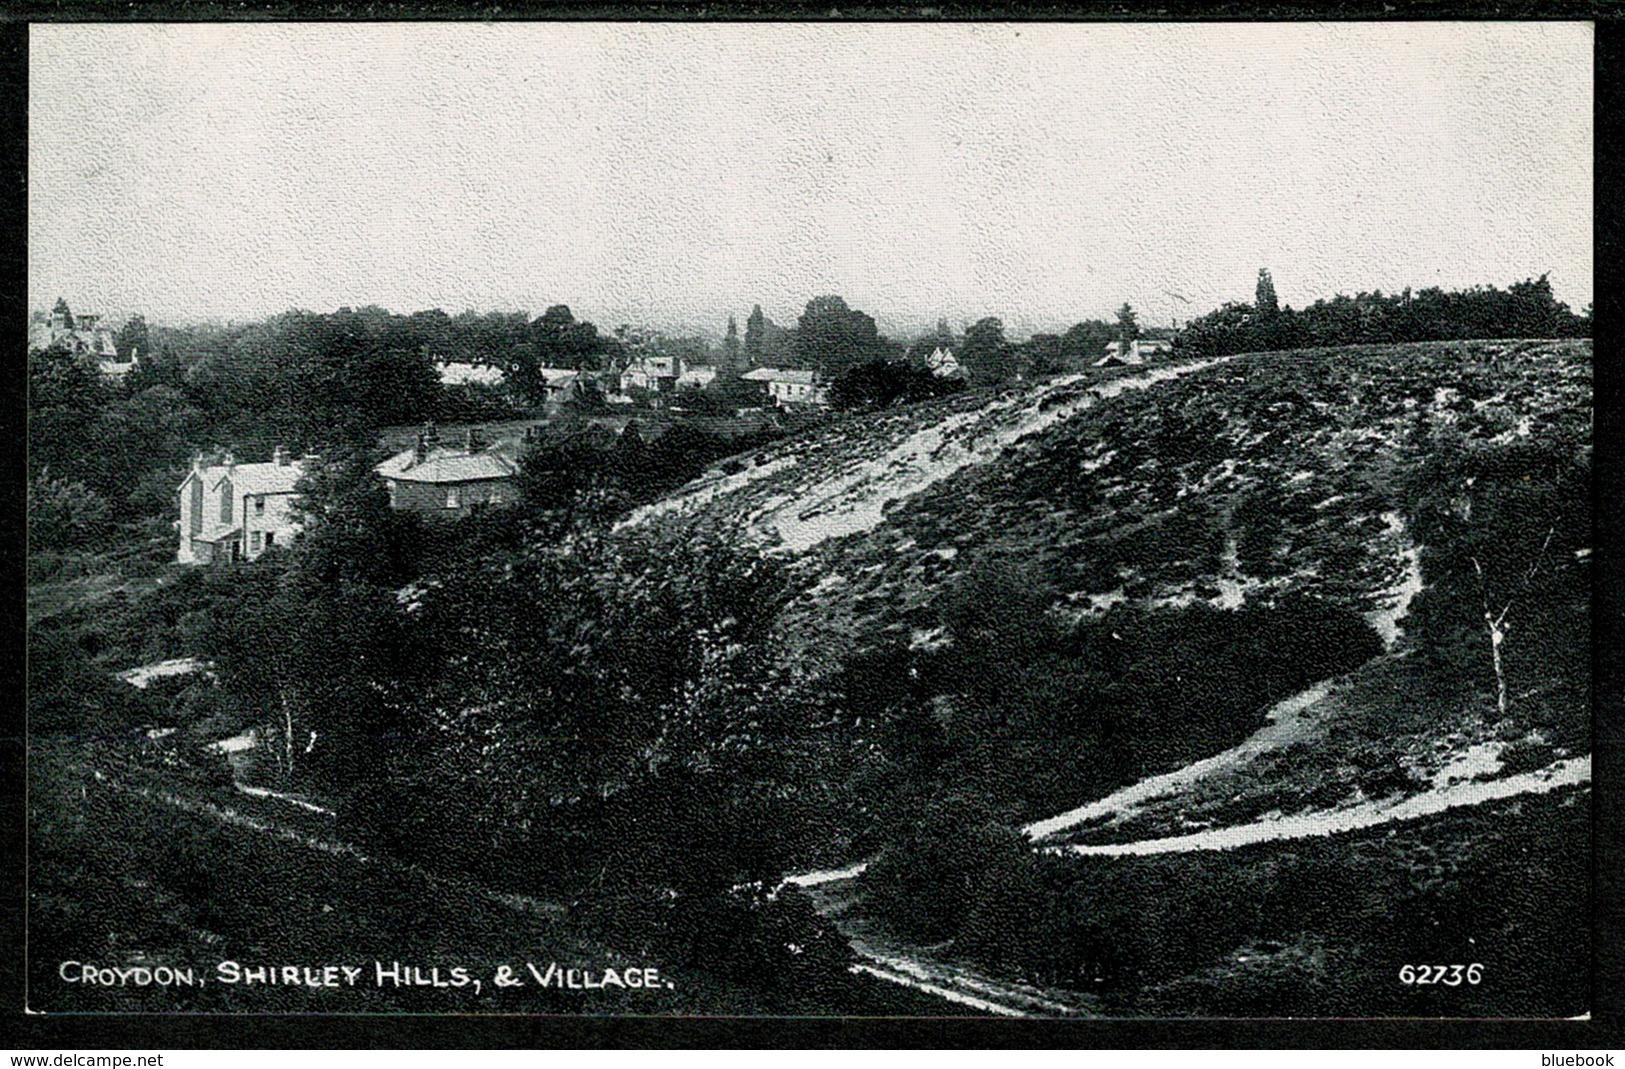 Ref 1258 - Early Postcard - Shirley Hills & Village - Croydon Surrey - Surrey